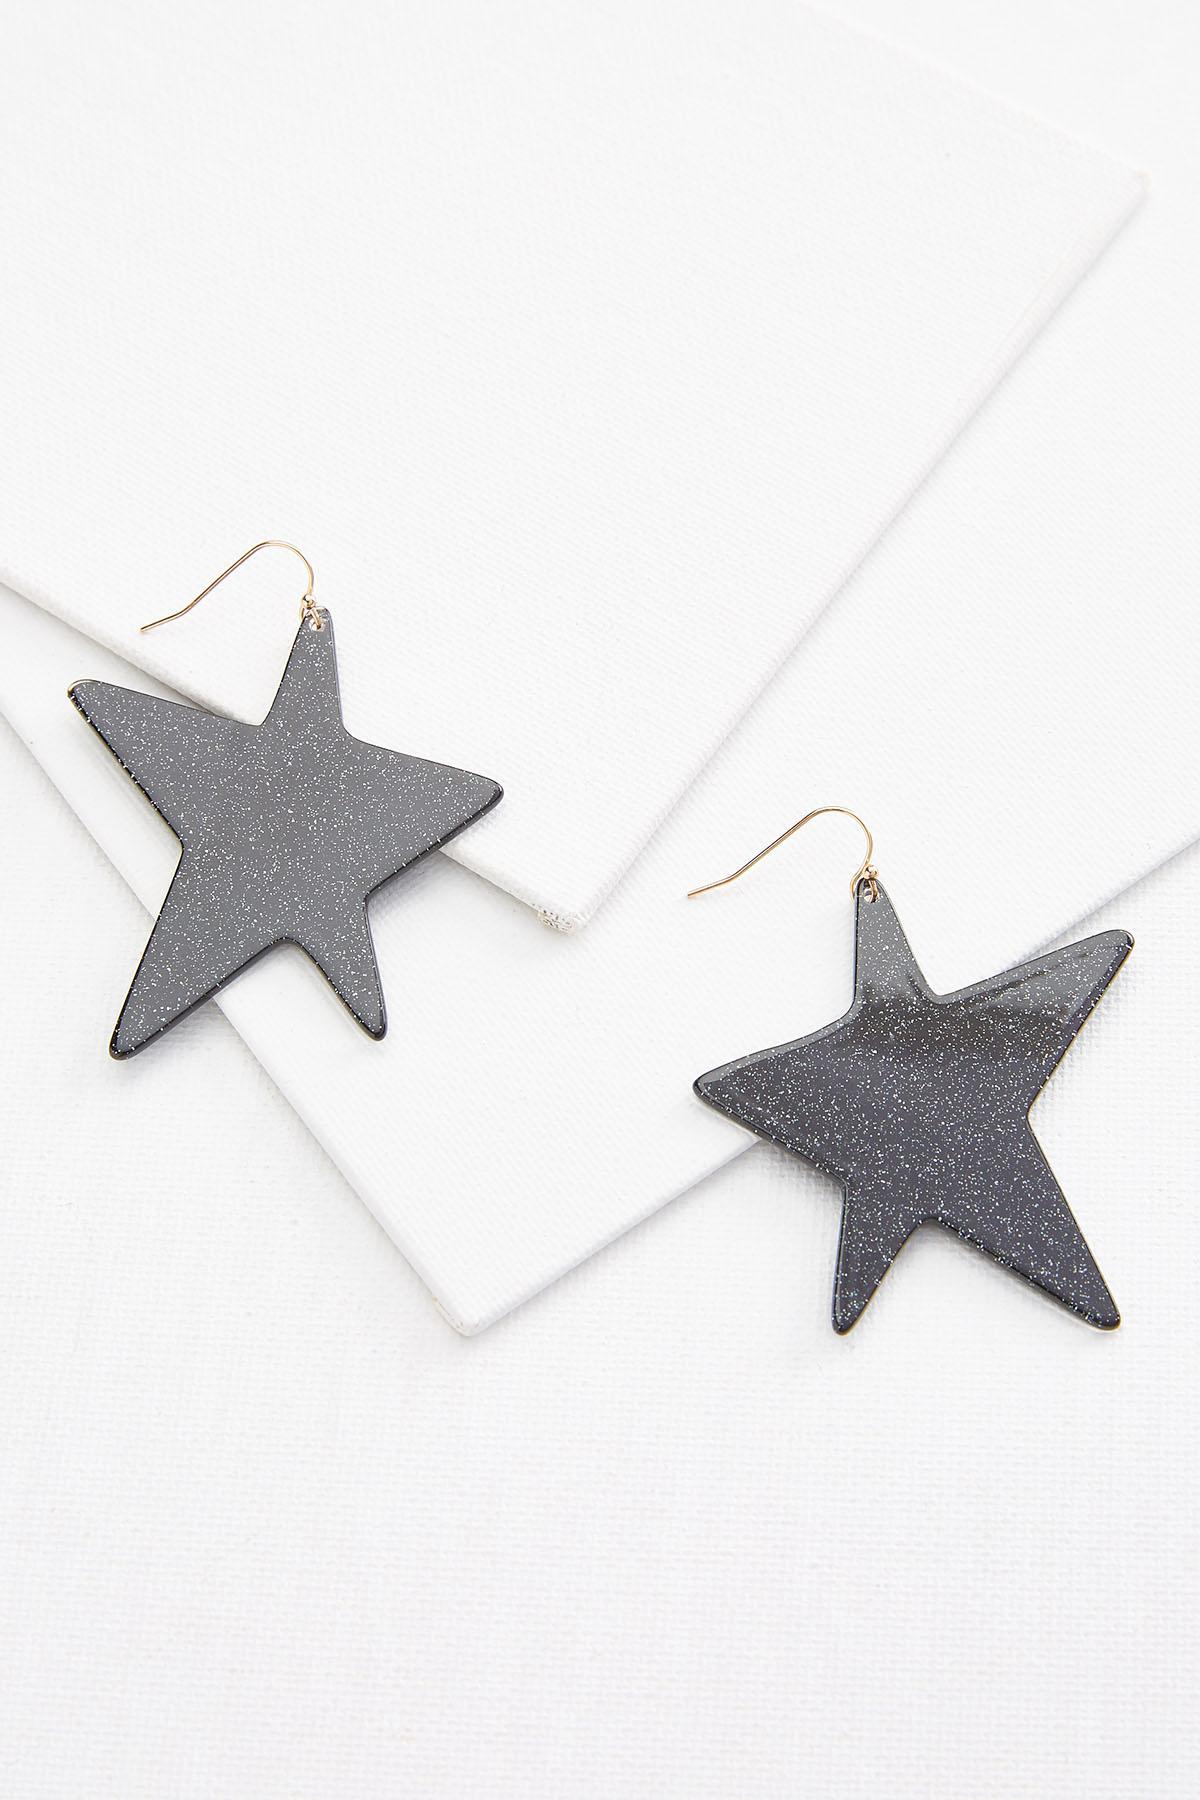 Retro Star Earrings